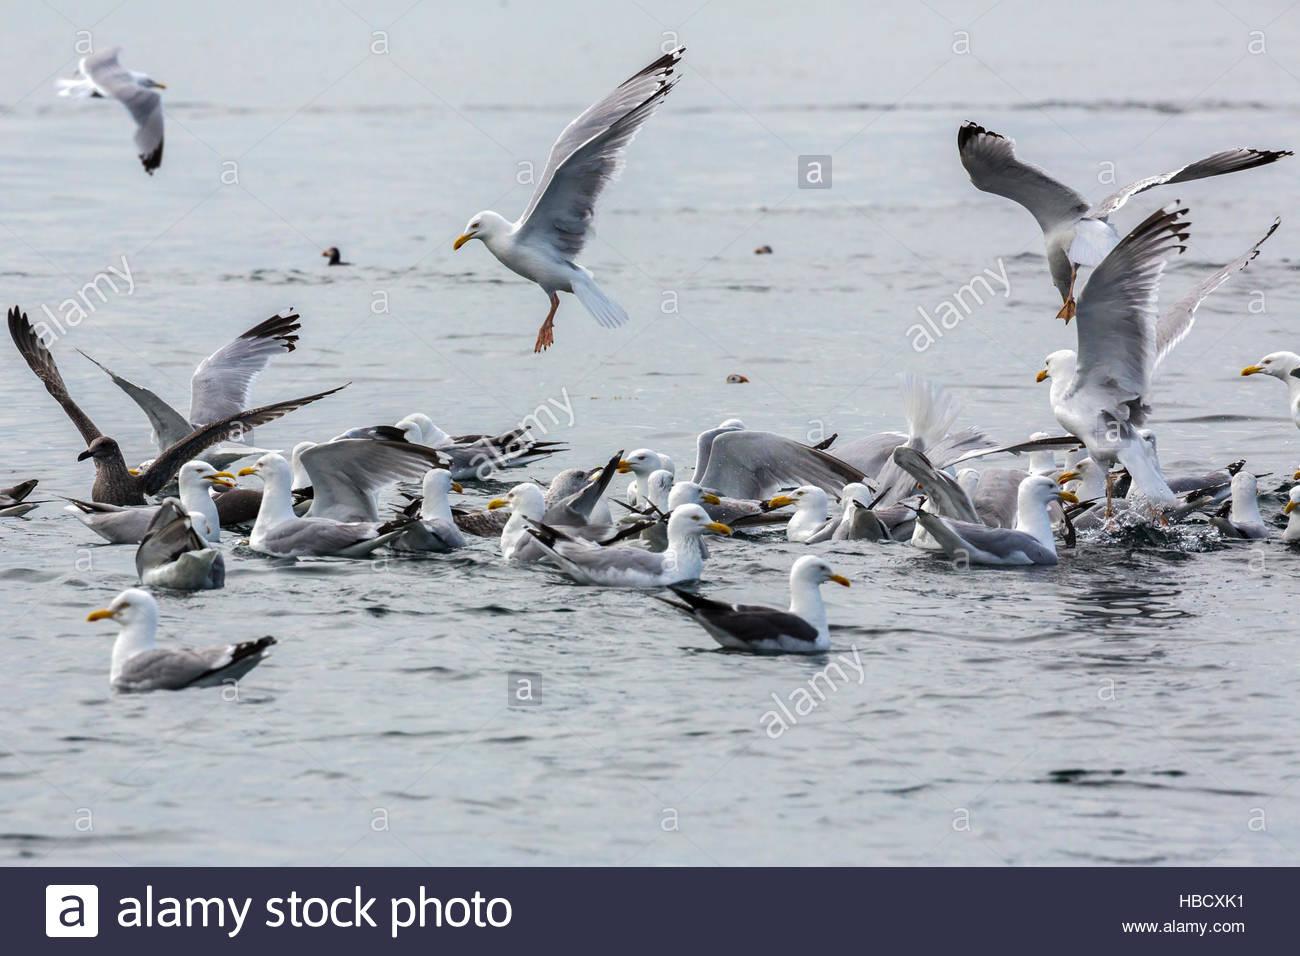 Herring gulls (Larus argentatus) at fish shoal, North Sea, Northumberland, UK, - Stock Image